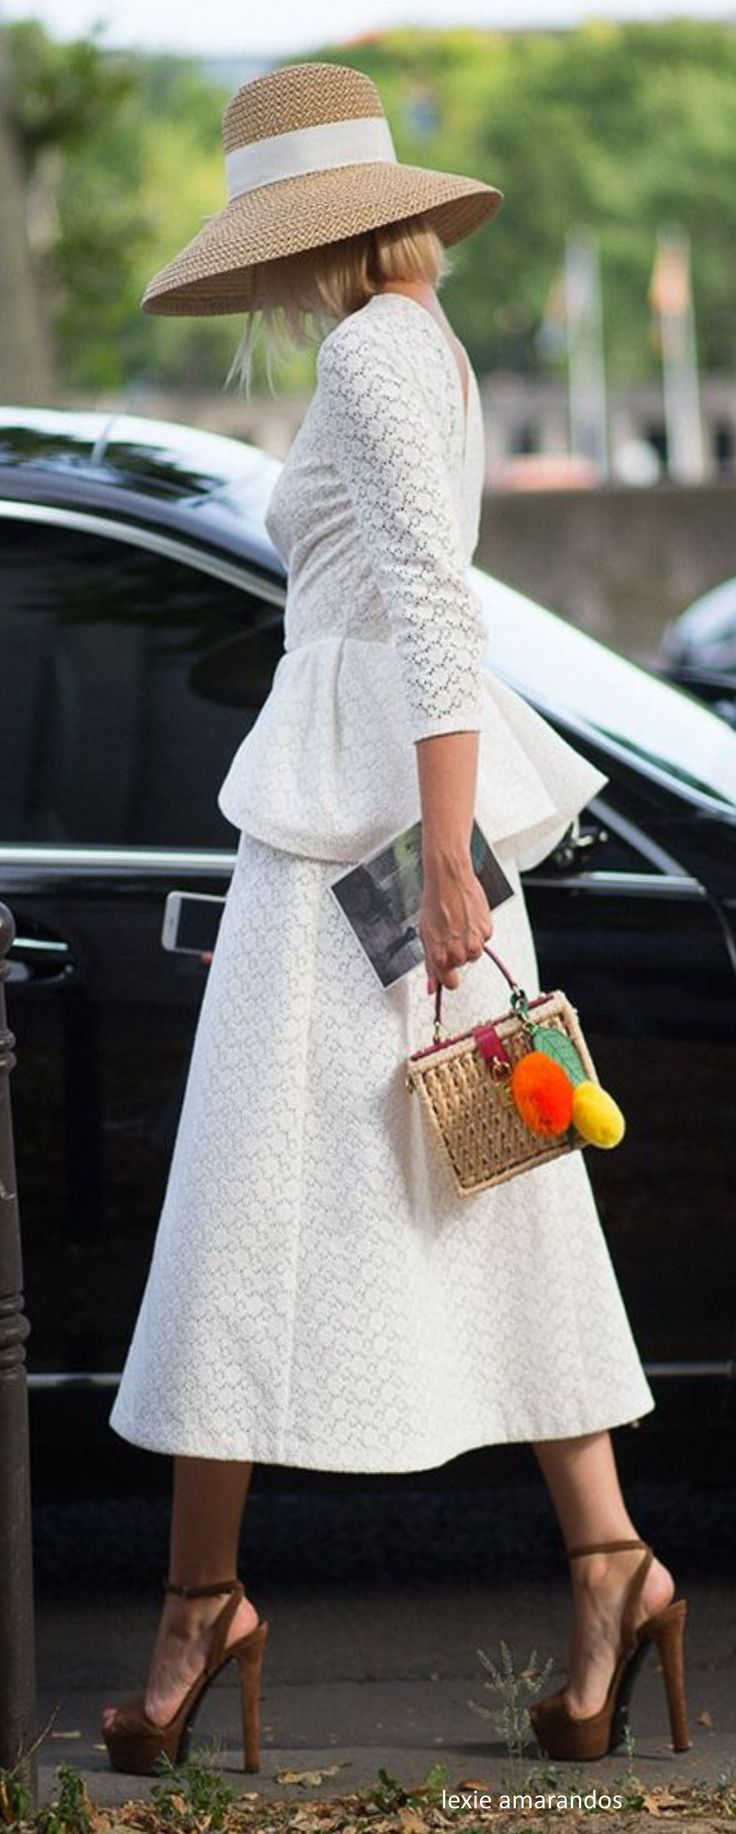 Love the lace...the peplum...the skirt length...the sleeve length...the high heels...